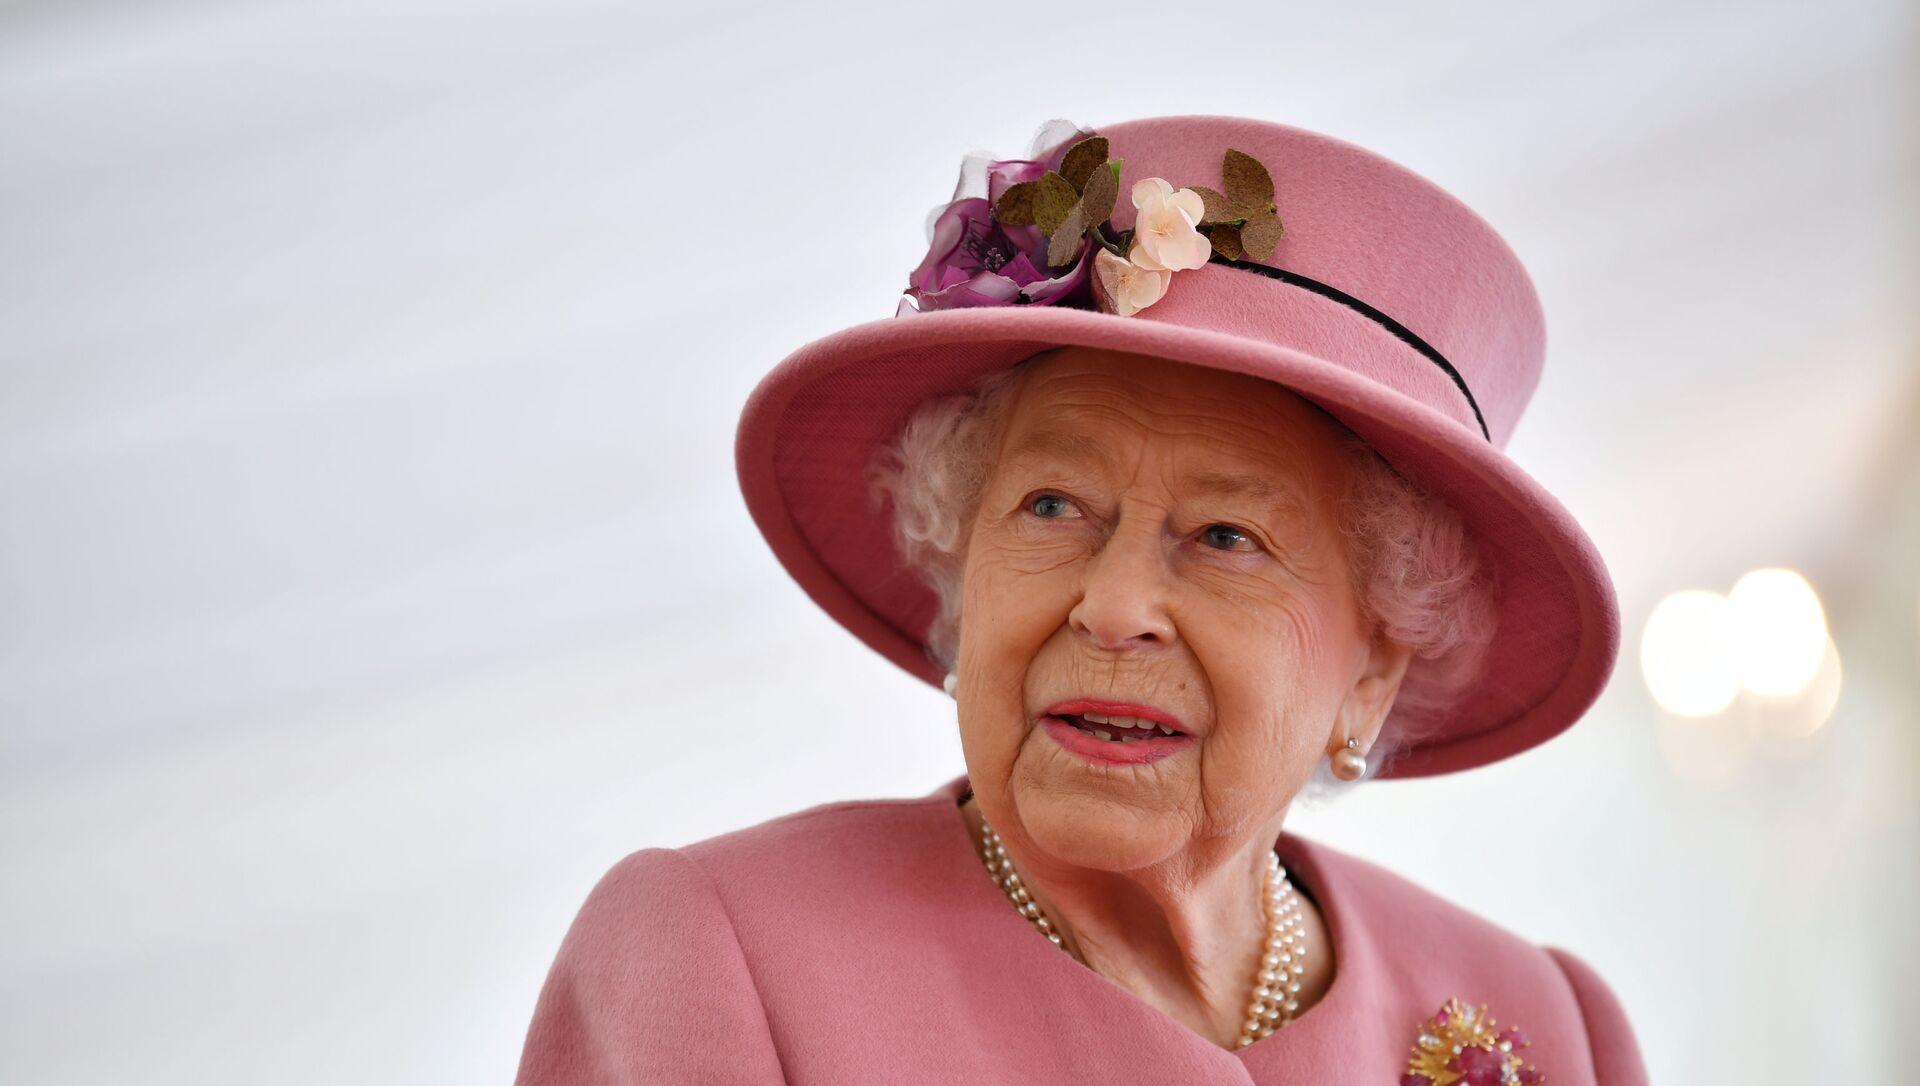 Isabel II, reina británica - Sputnik Mundo, 1920, 24.10.2020